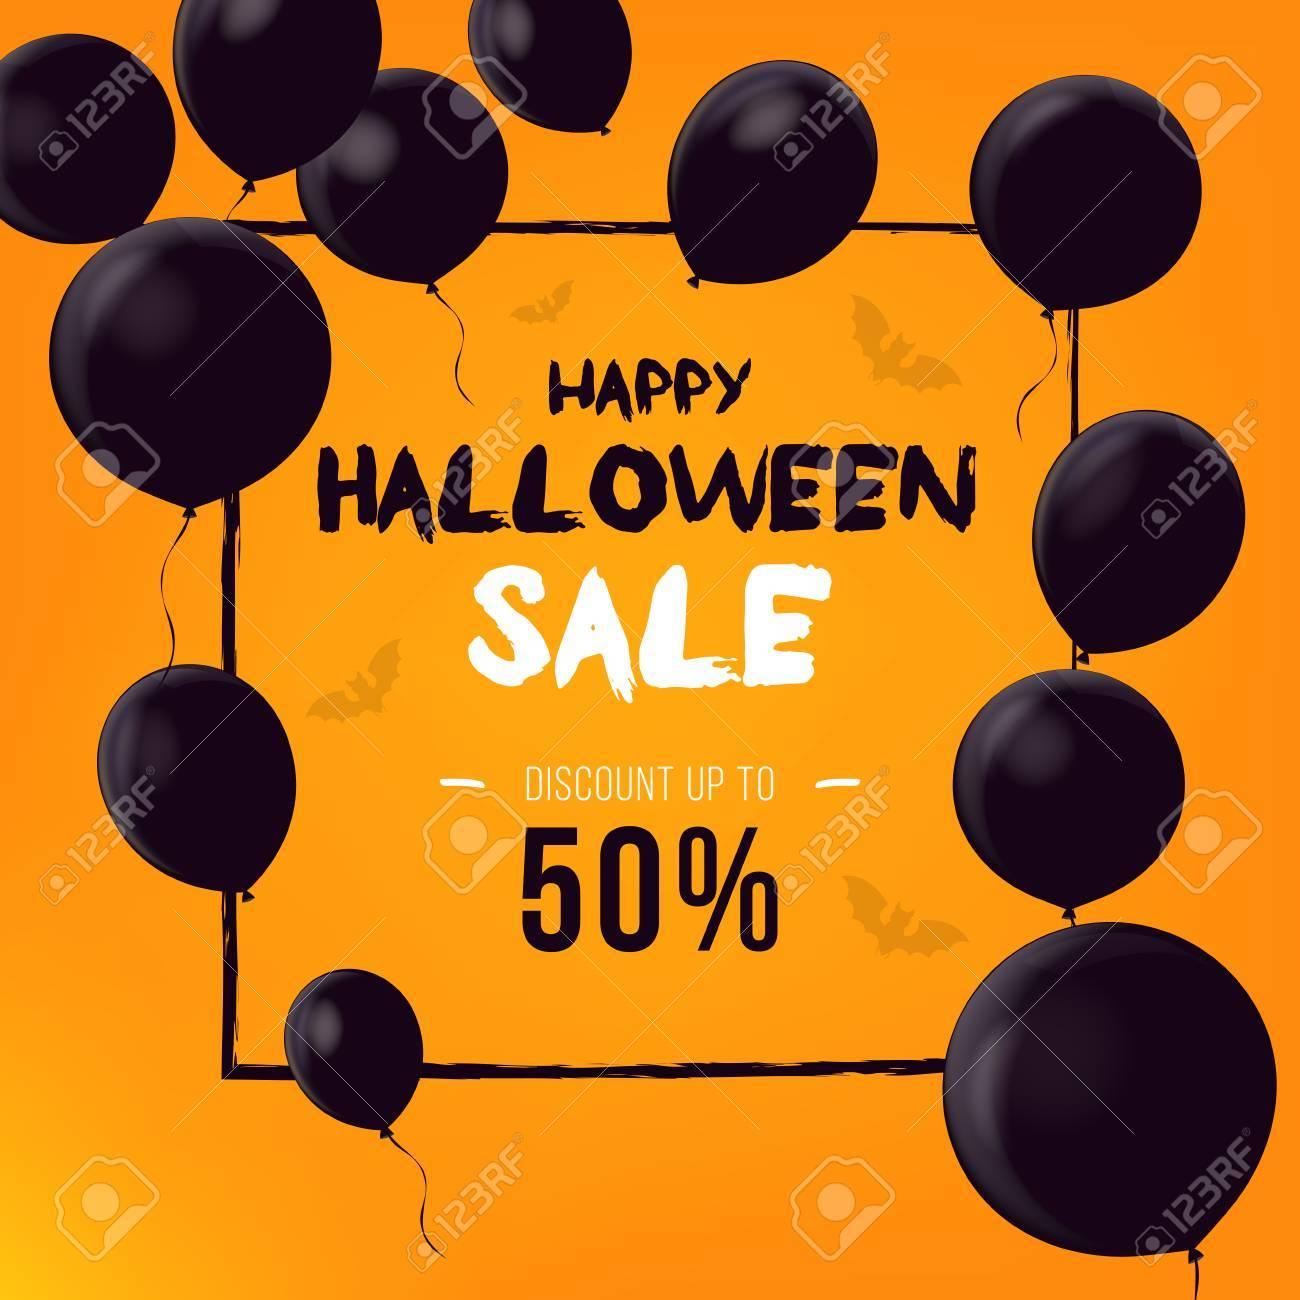 halloween backdrop with black balloons sale banner template design stock vector 87209634